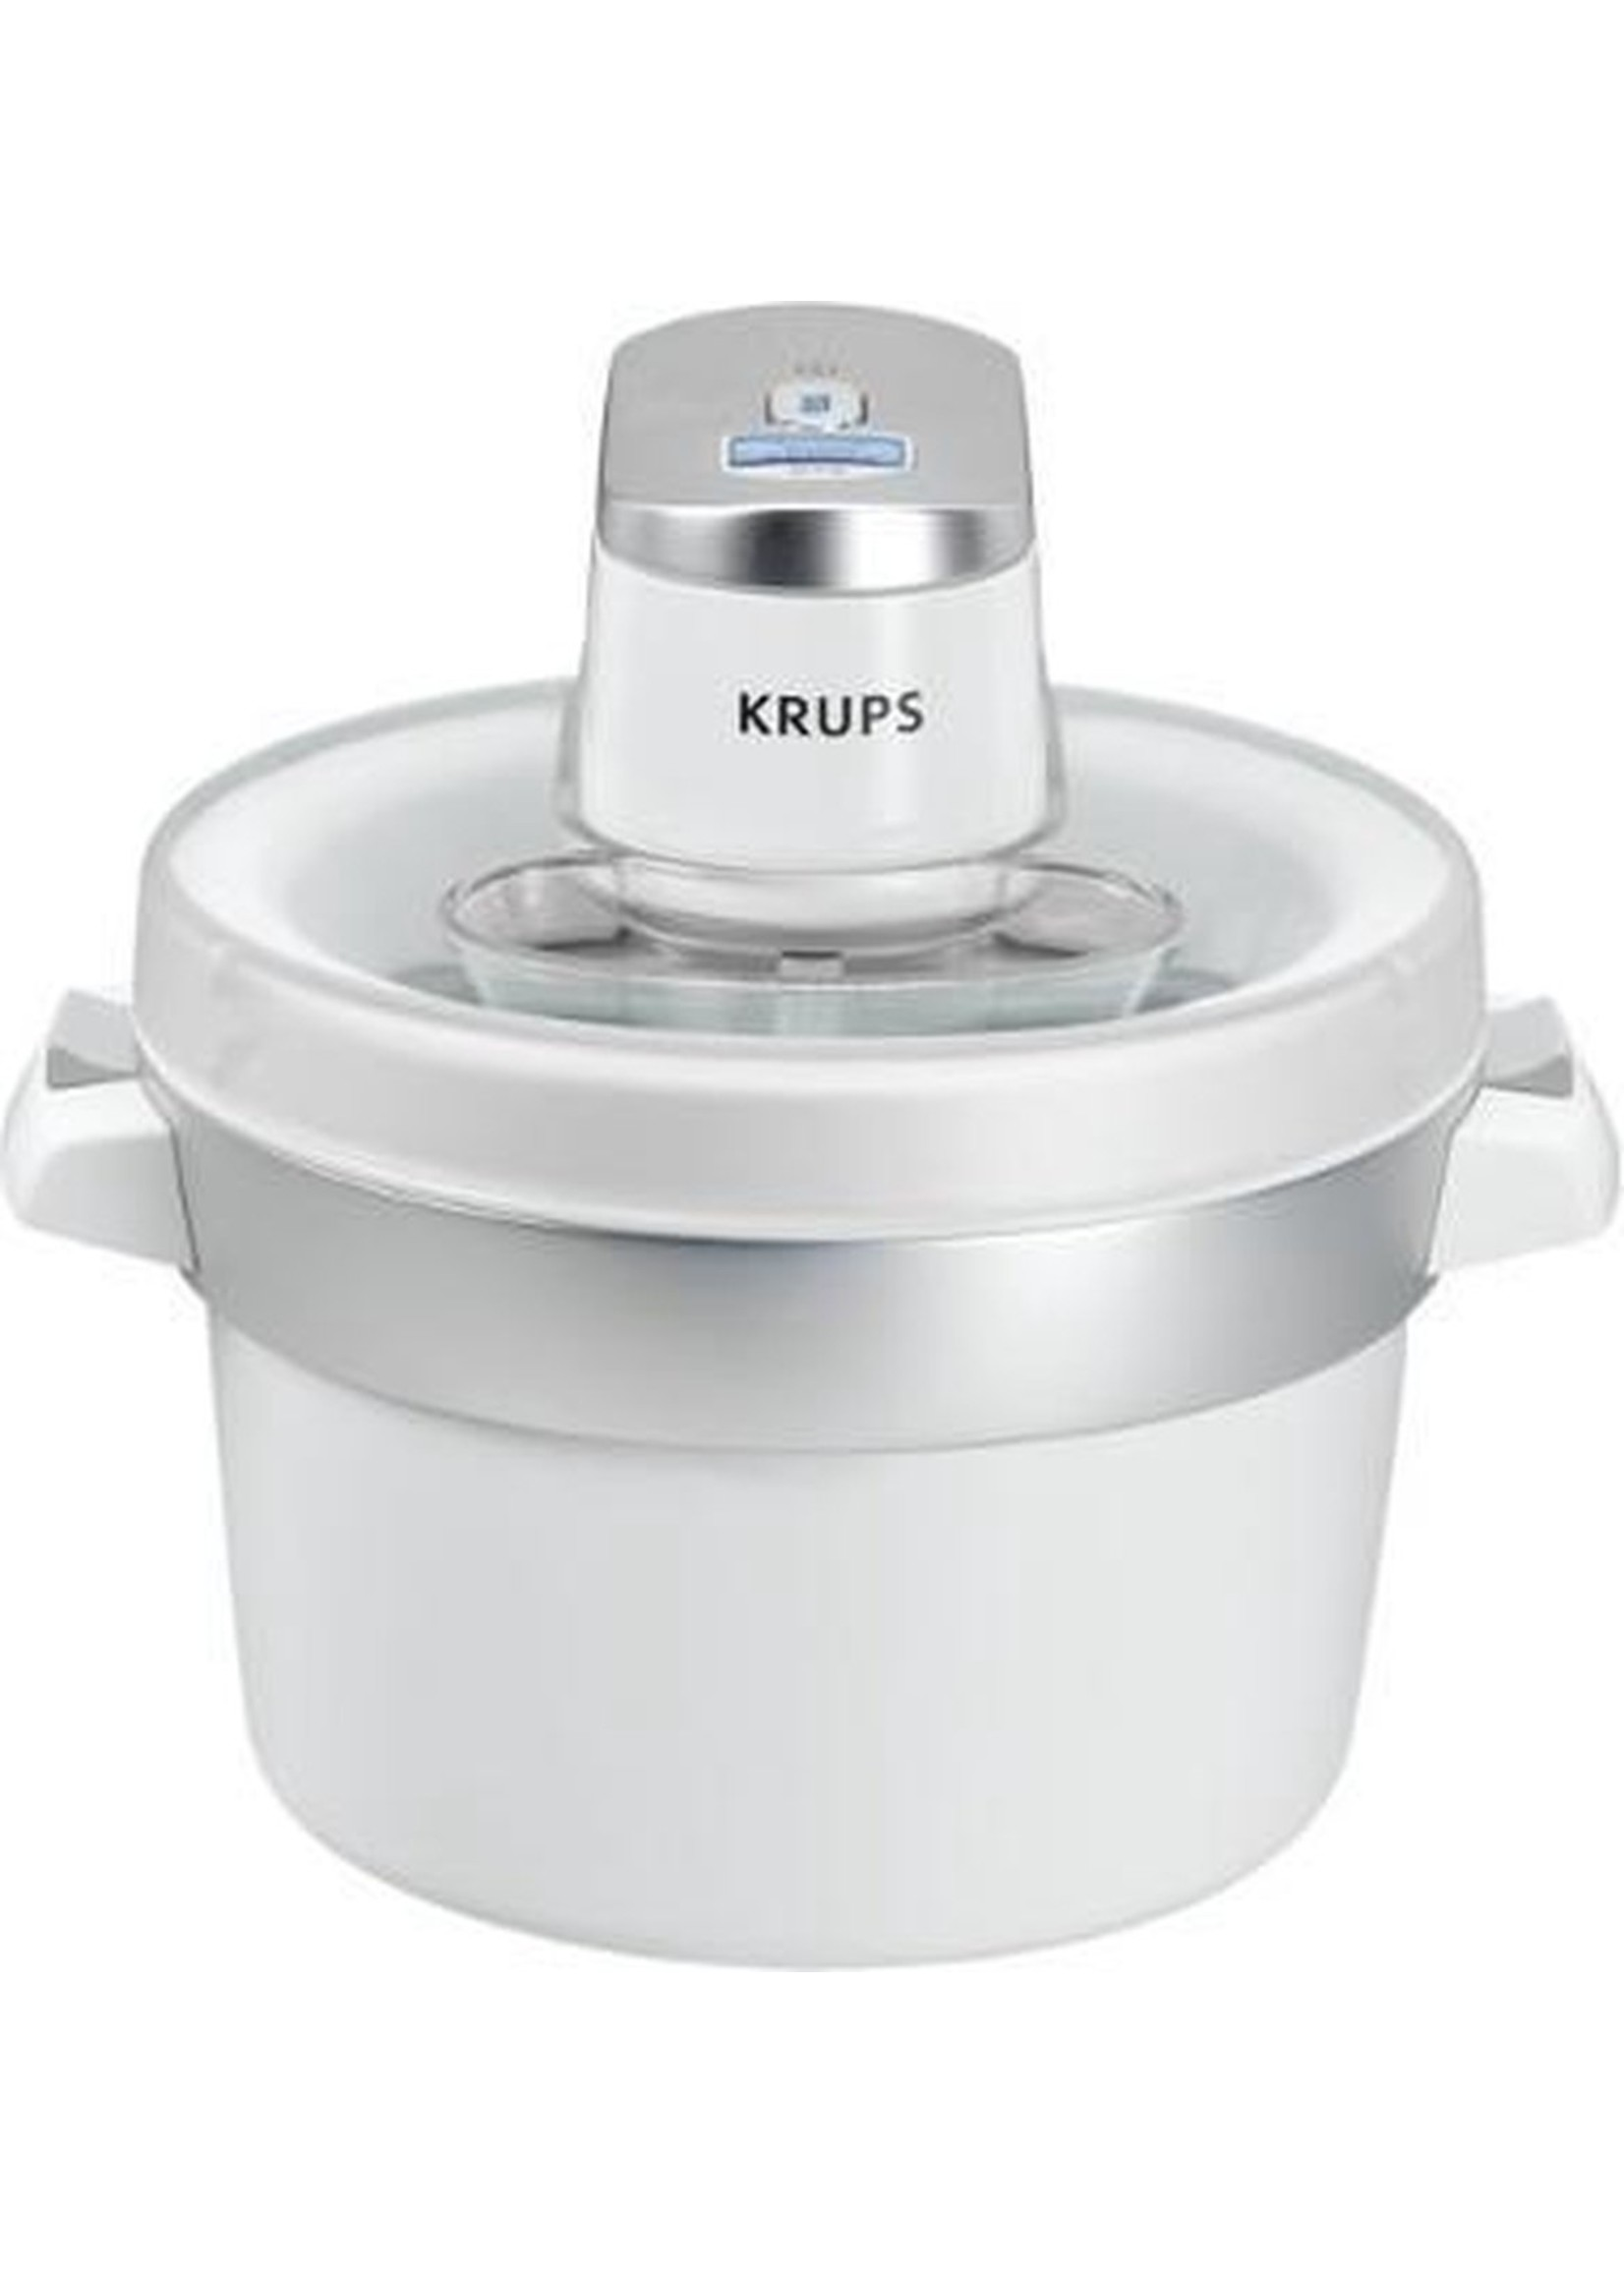 krups Krups Perfect Mix 9000 GVS241 - IJsmachine koopjeshoek